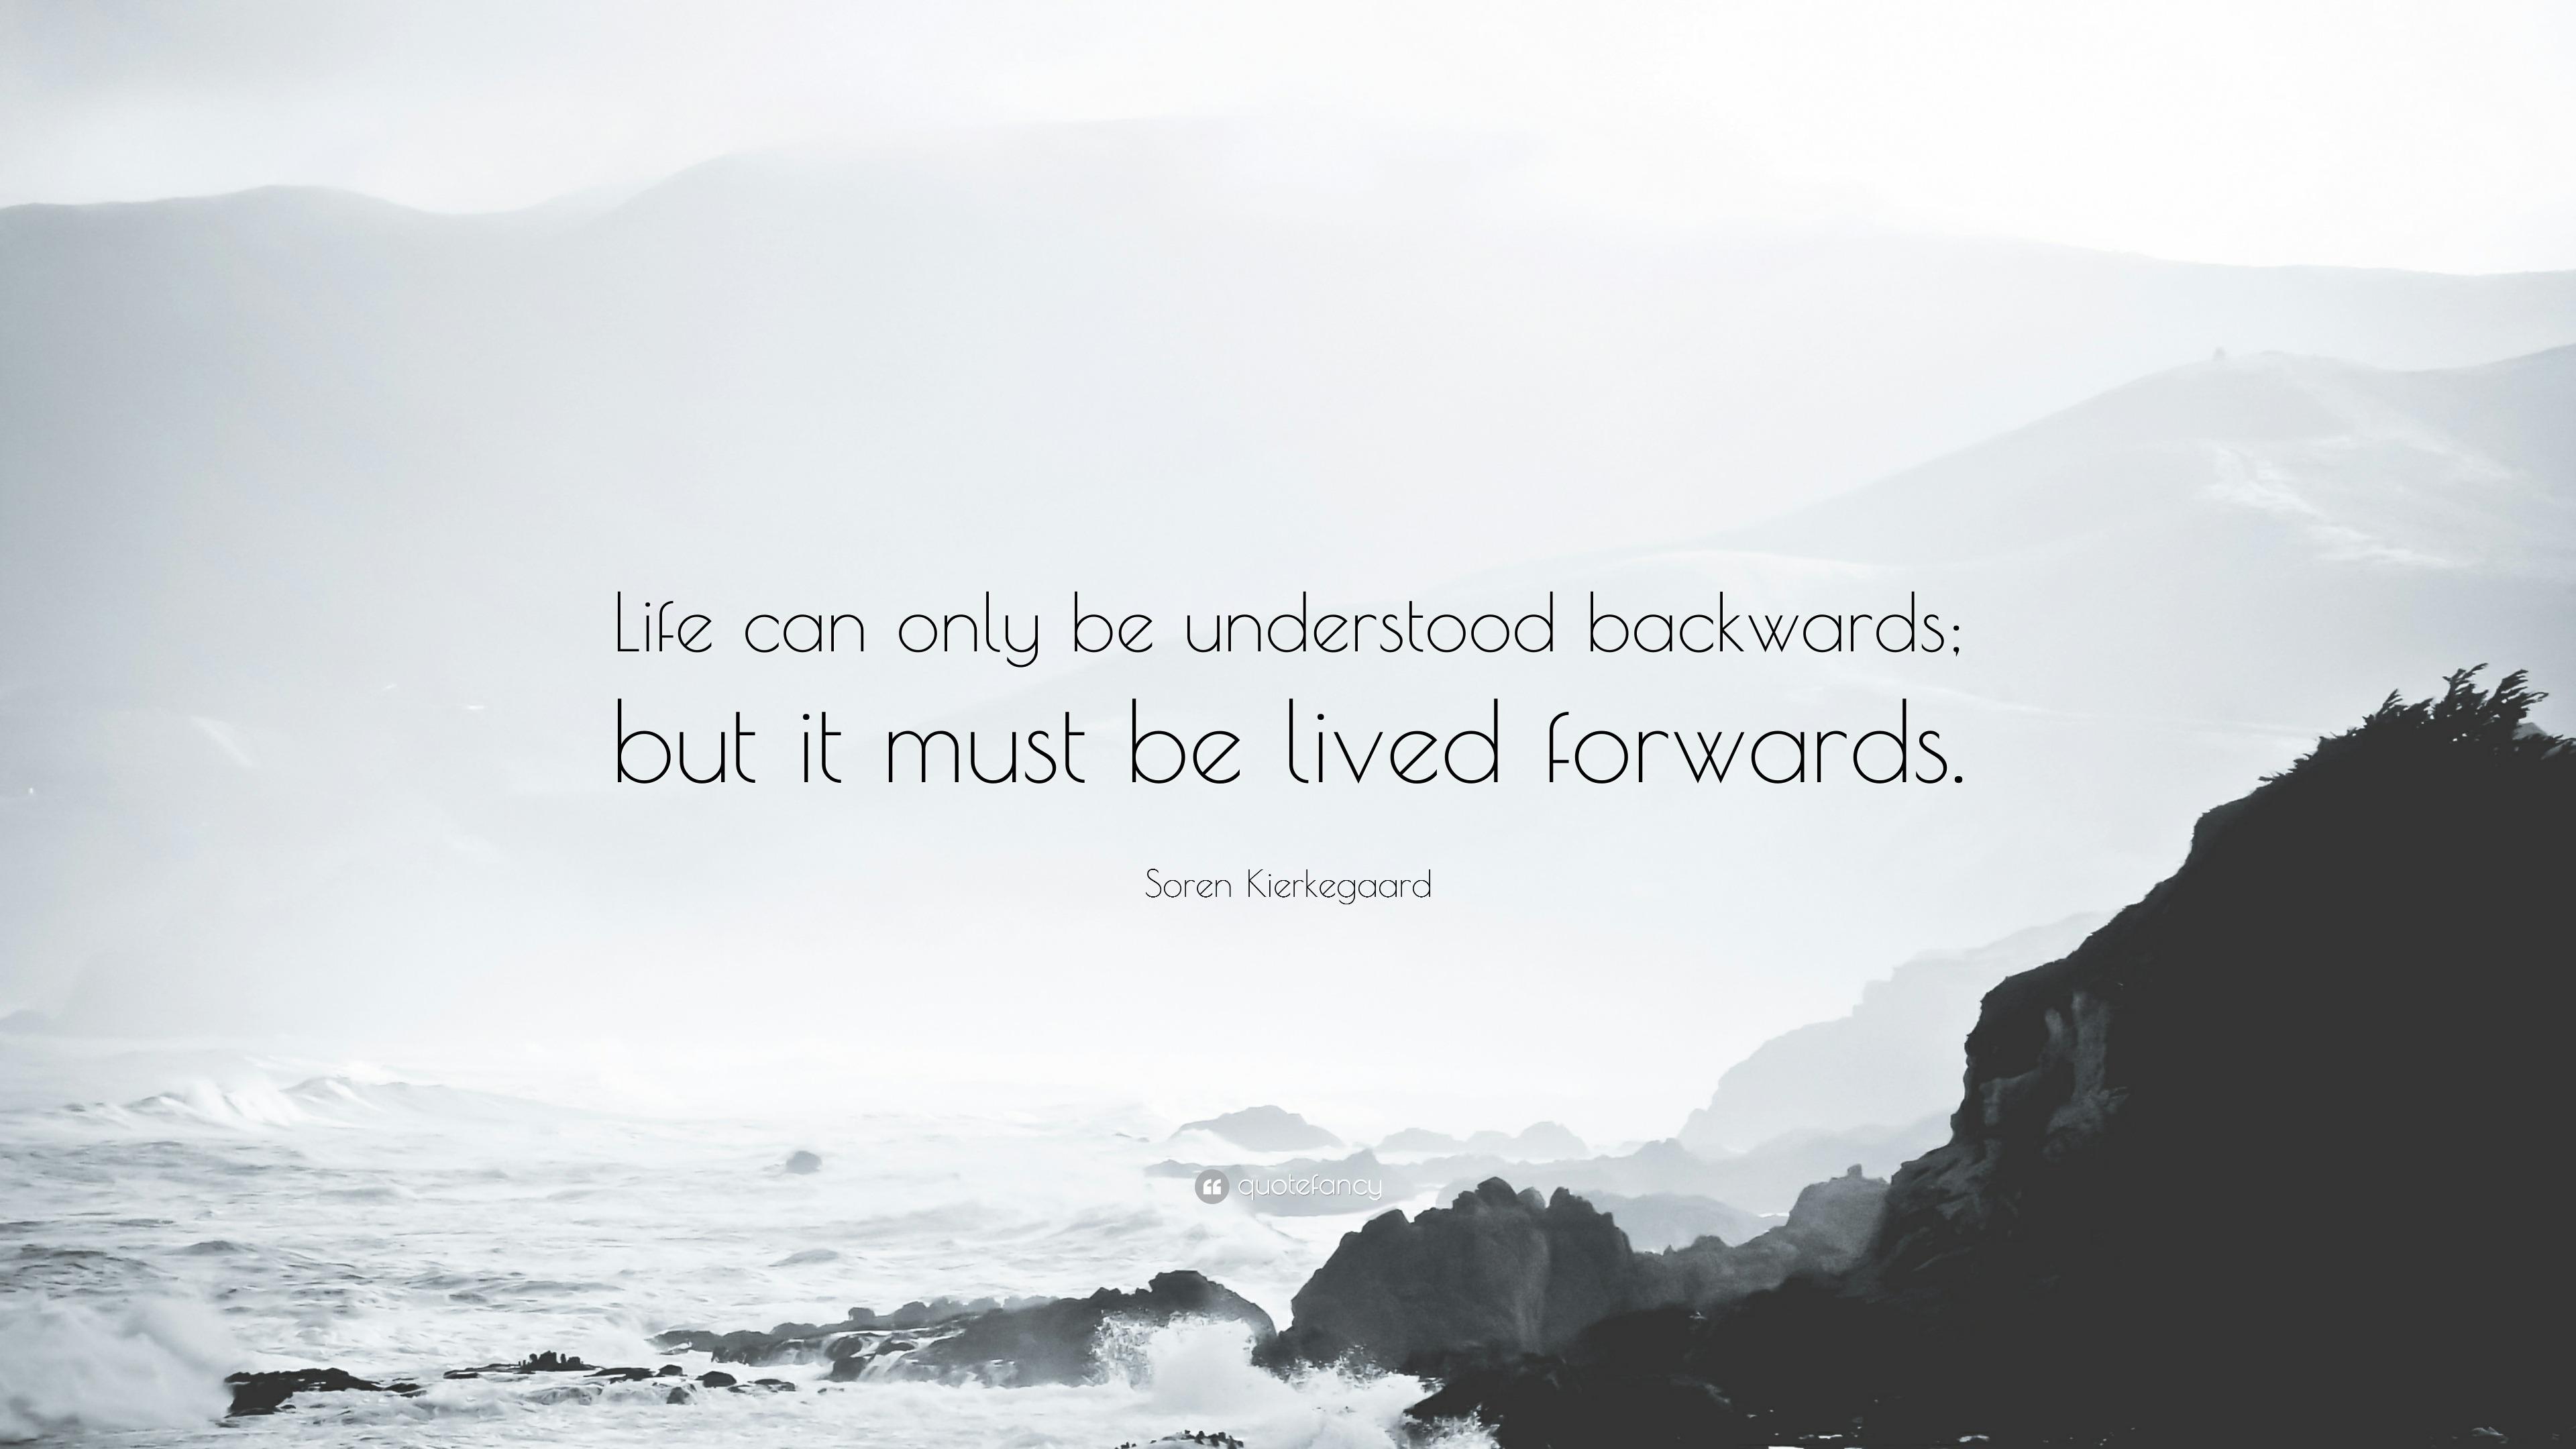 Chanakya Quotes Wallpaper Soren Kierkegaard Quote Life Can Only Be Understood